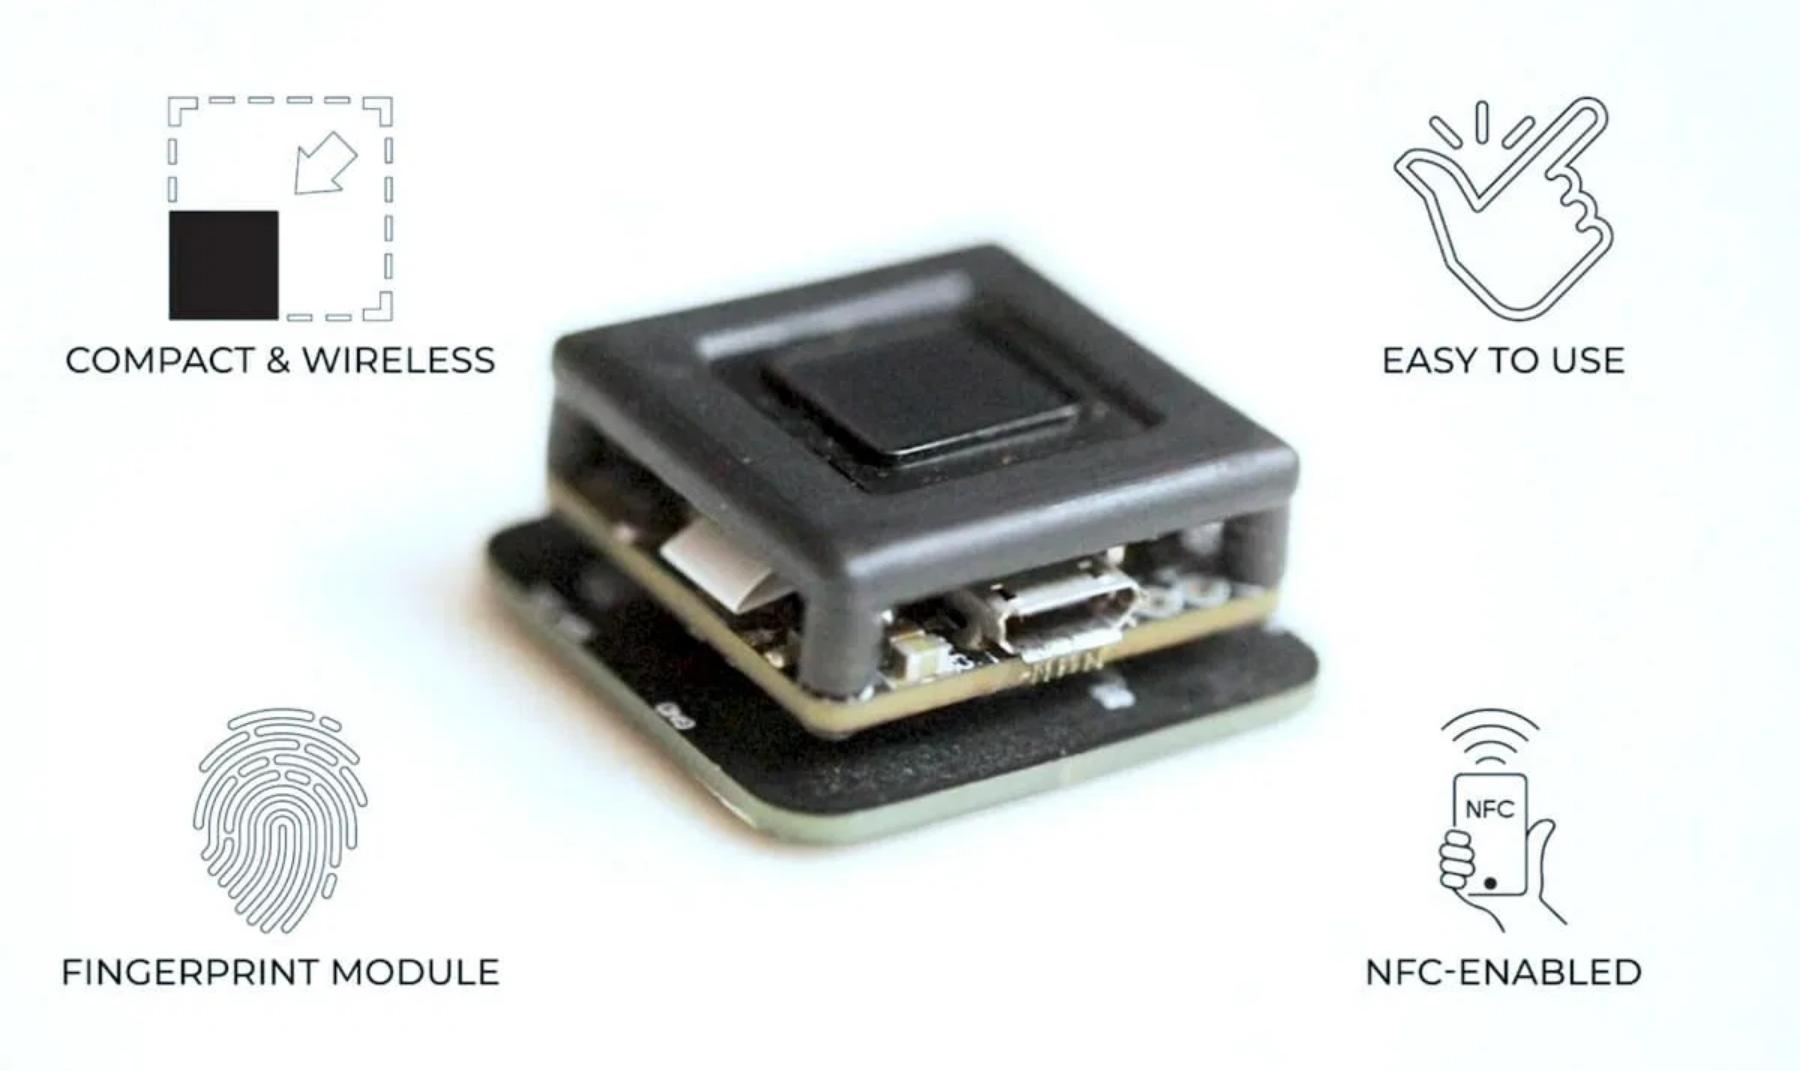 Chhavi – Ultra-Low-Power Fingerprint Sensor Featuring ESP32 SoC